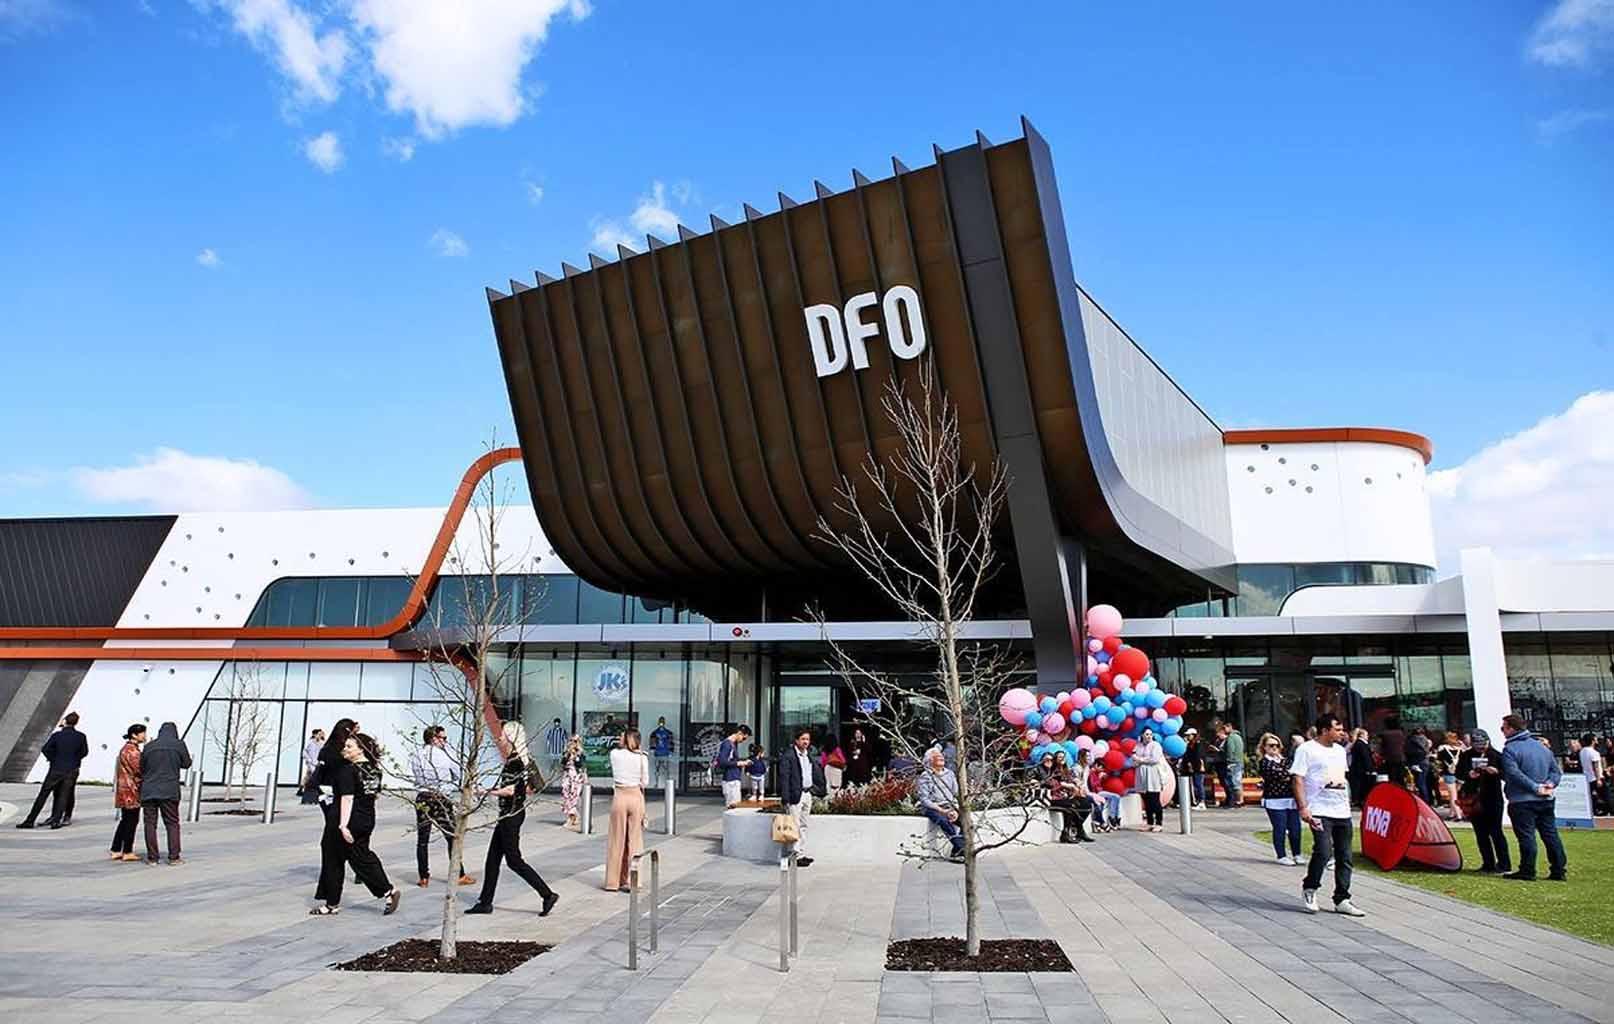 Mua sắm tại DFO